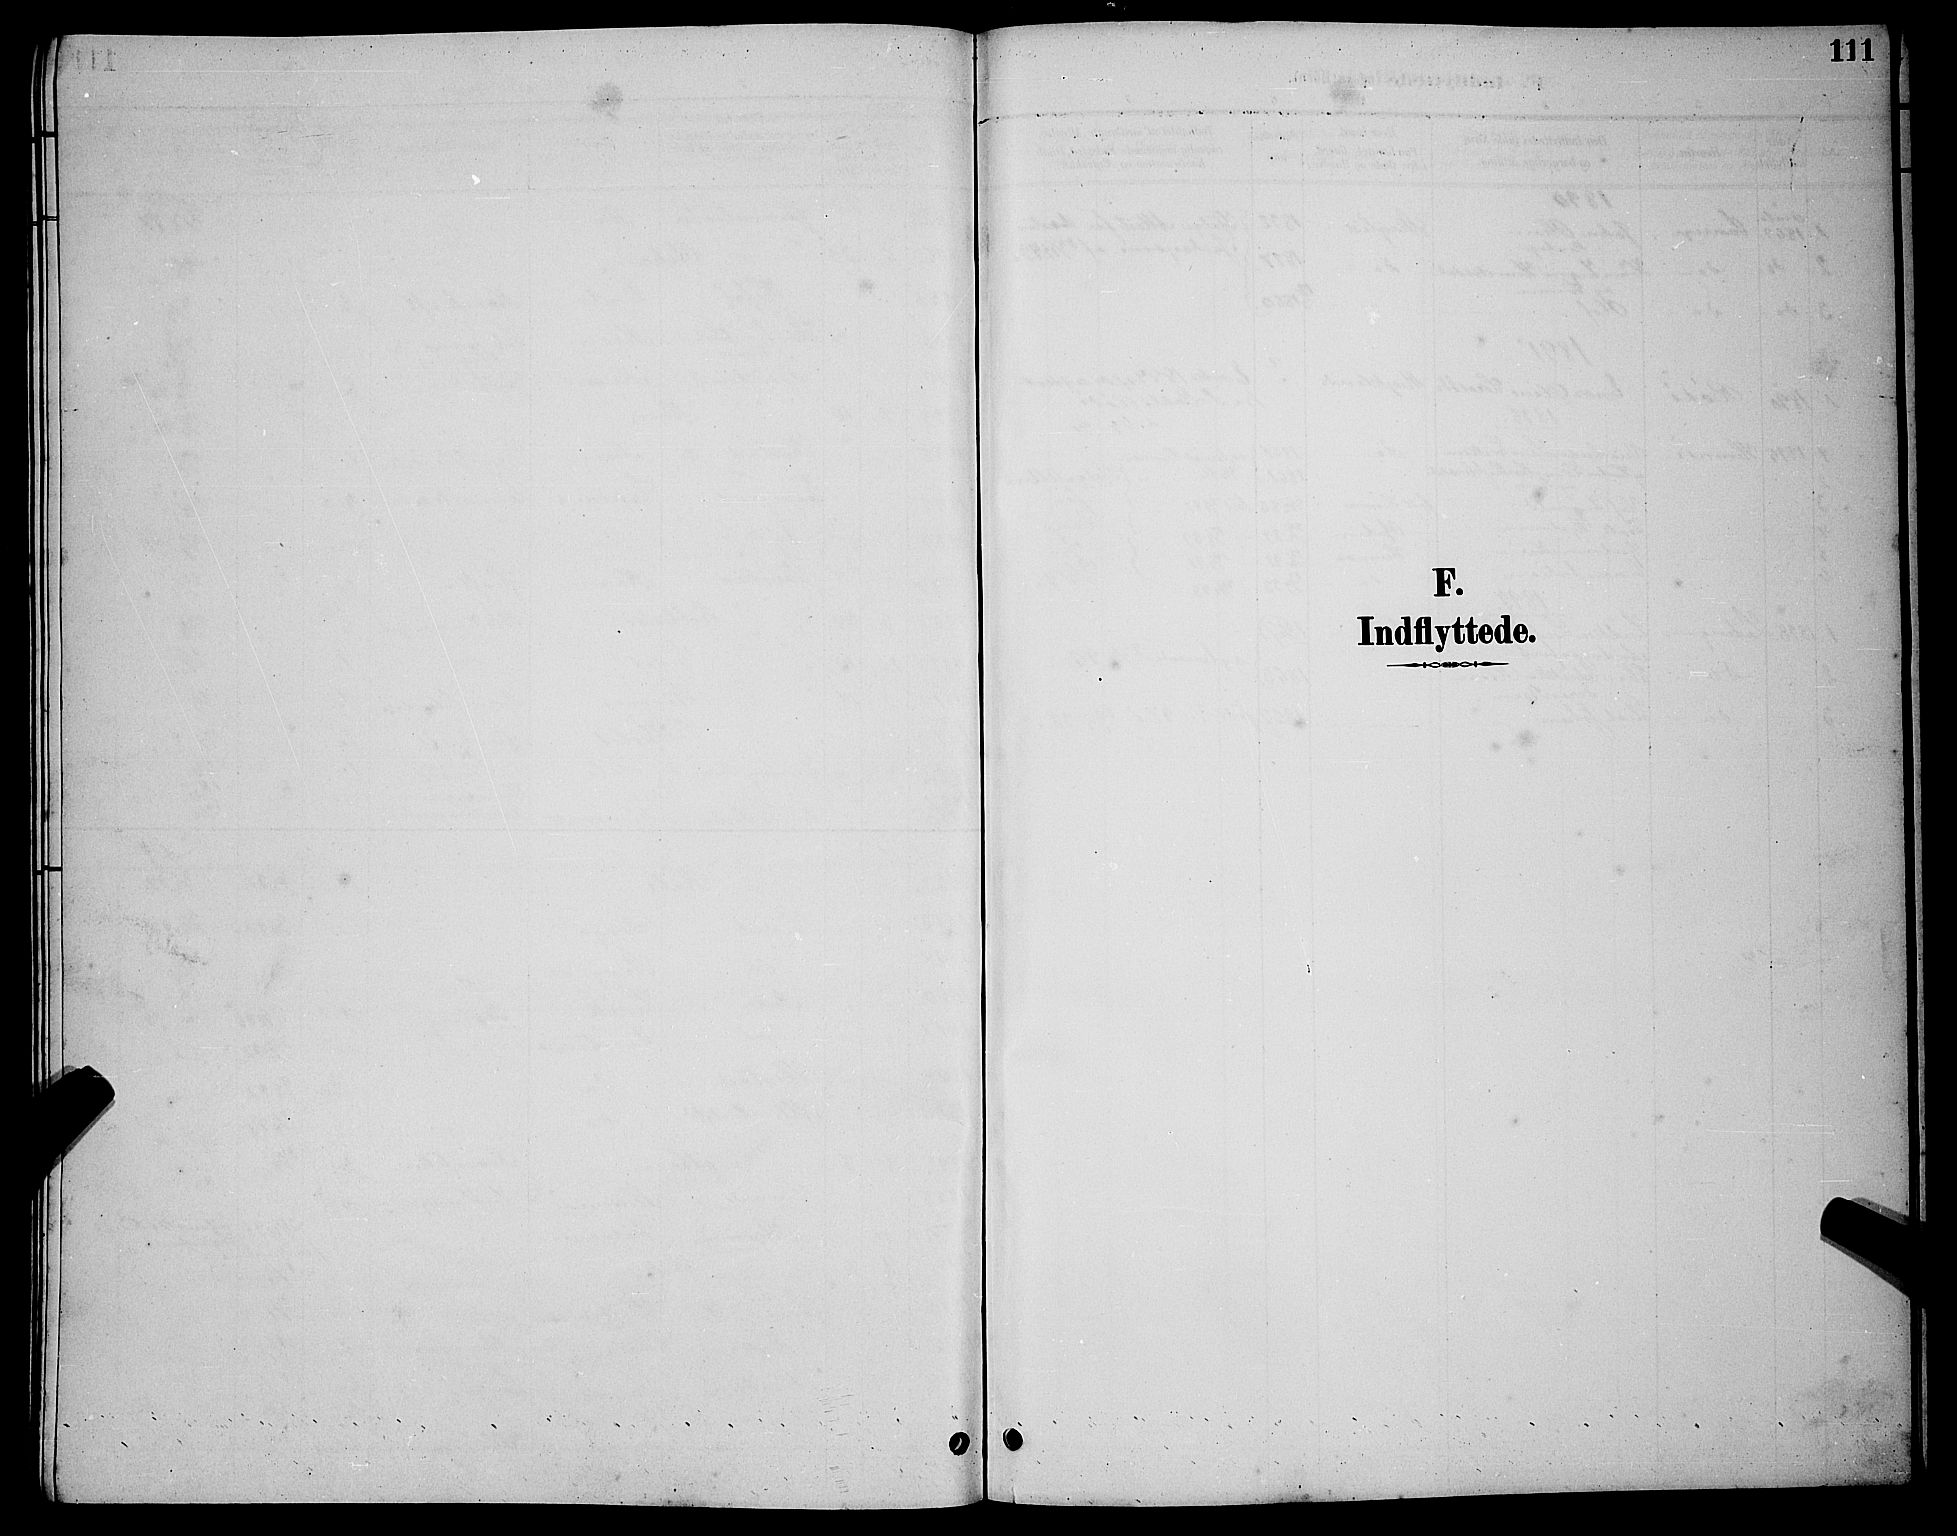 SATØ, Tranøy sokneprestkontor, I/Ia/Iab/L0004klokker: Klokkerbok nr. 4, 1888-1901, s. 111